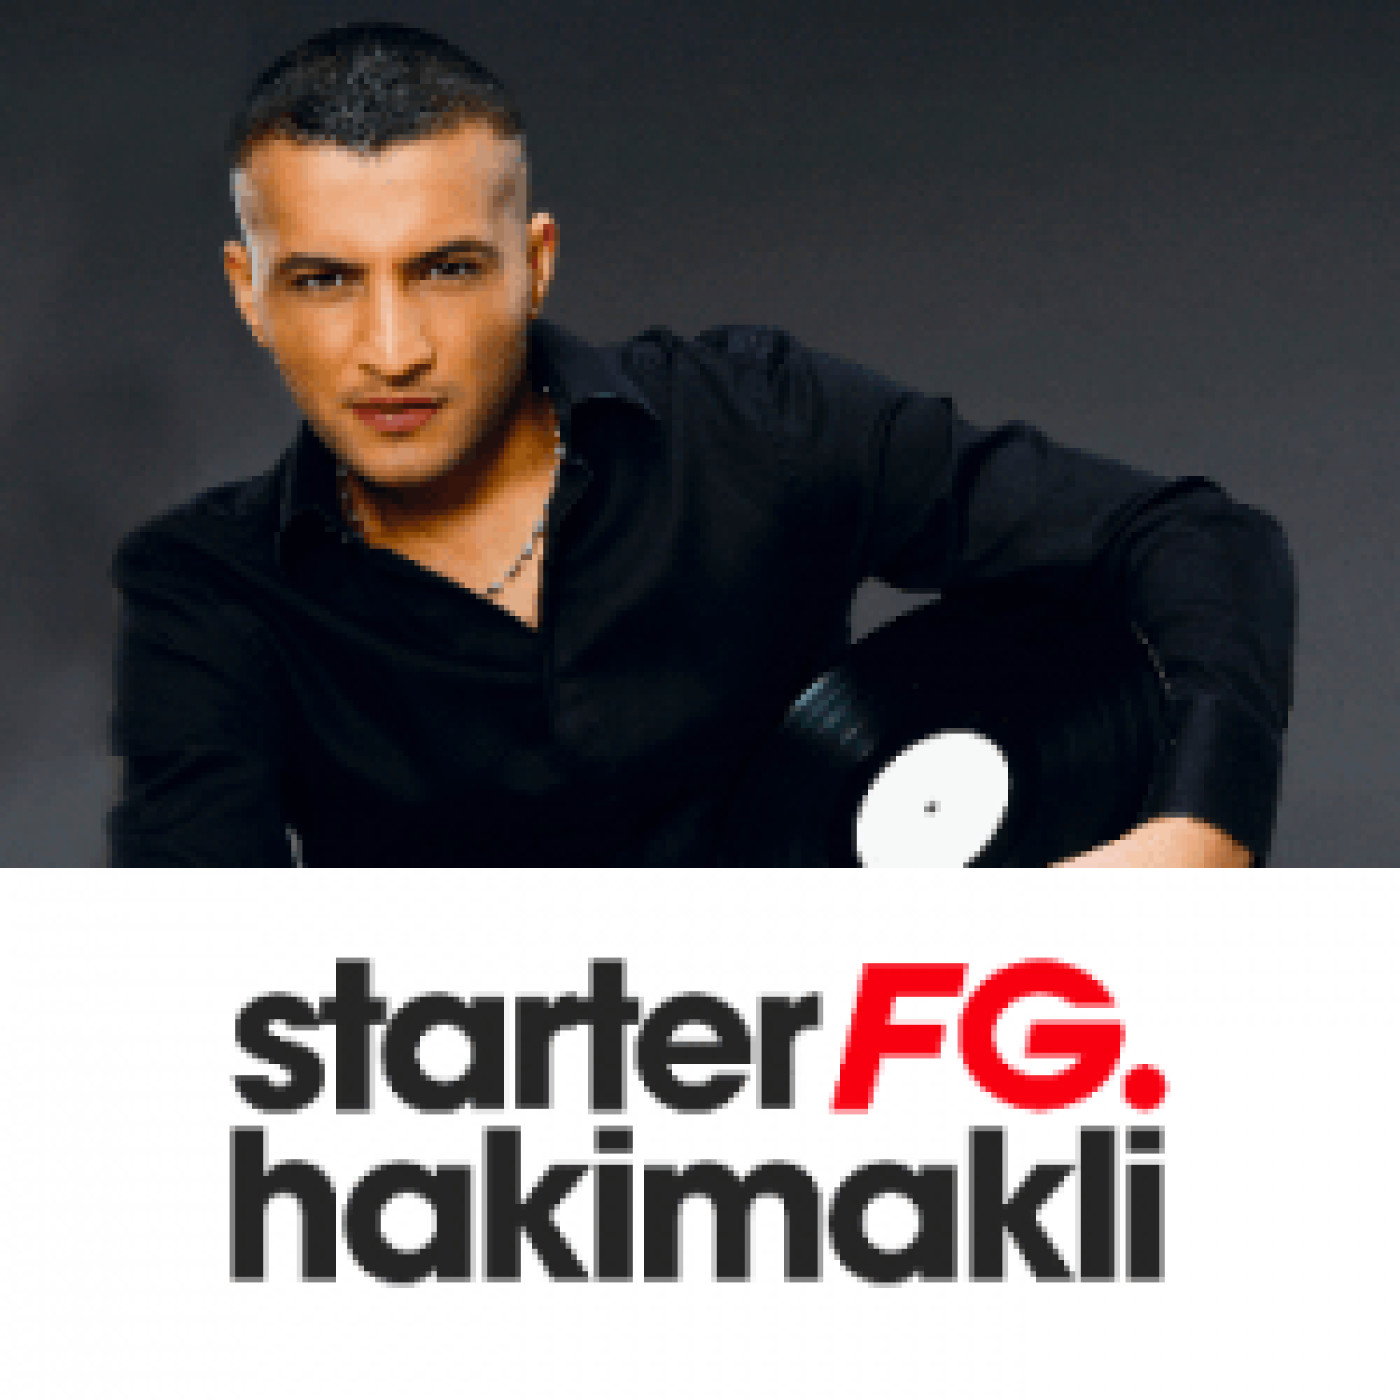 STARTER FG BY HAKIMAKLI LUNDI 14 DECEMBRE 2020